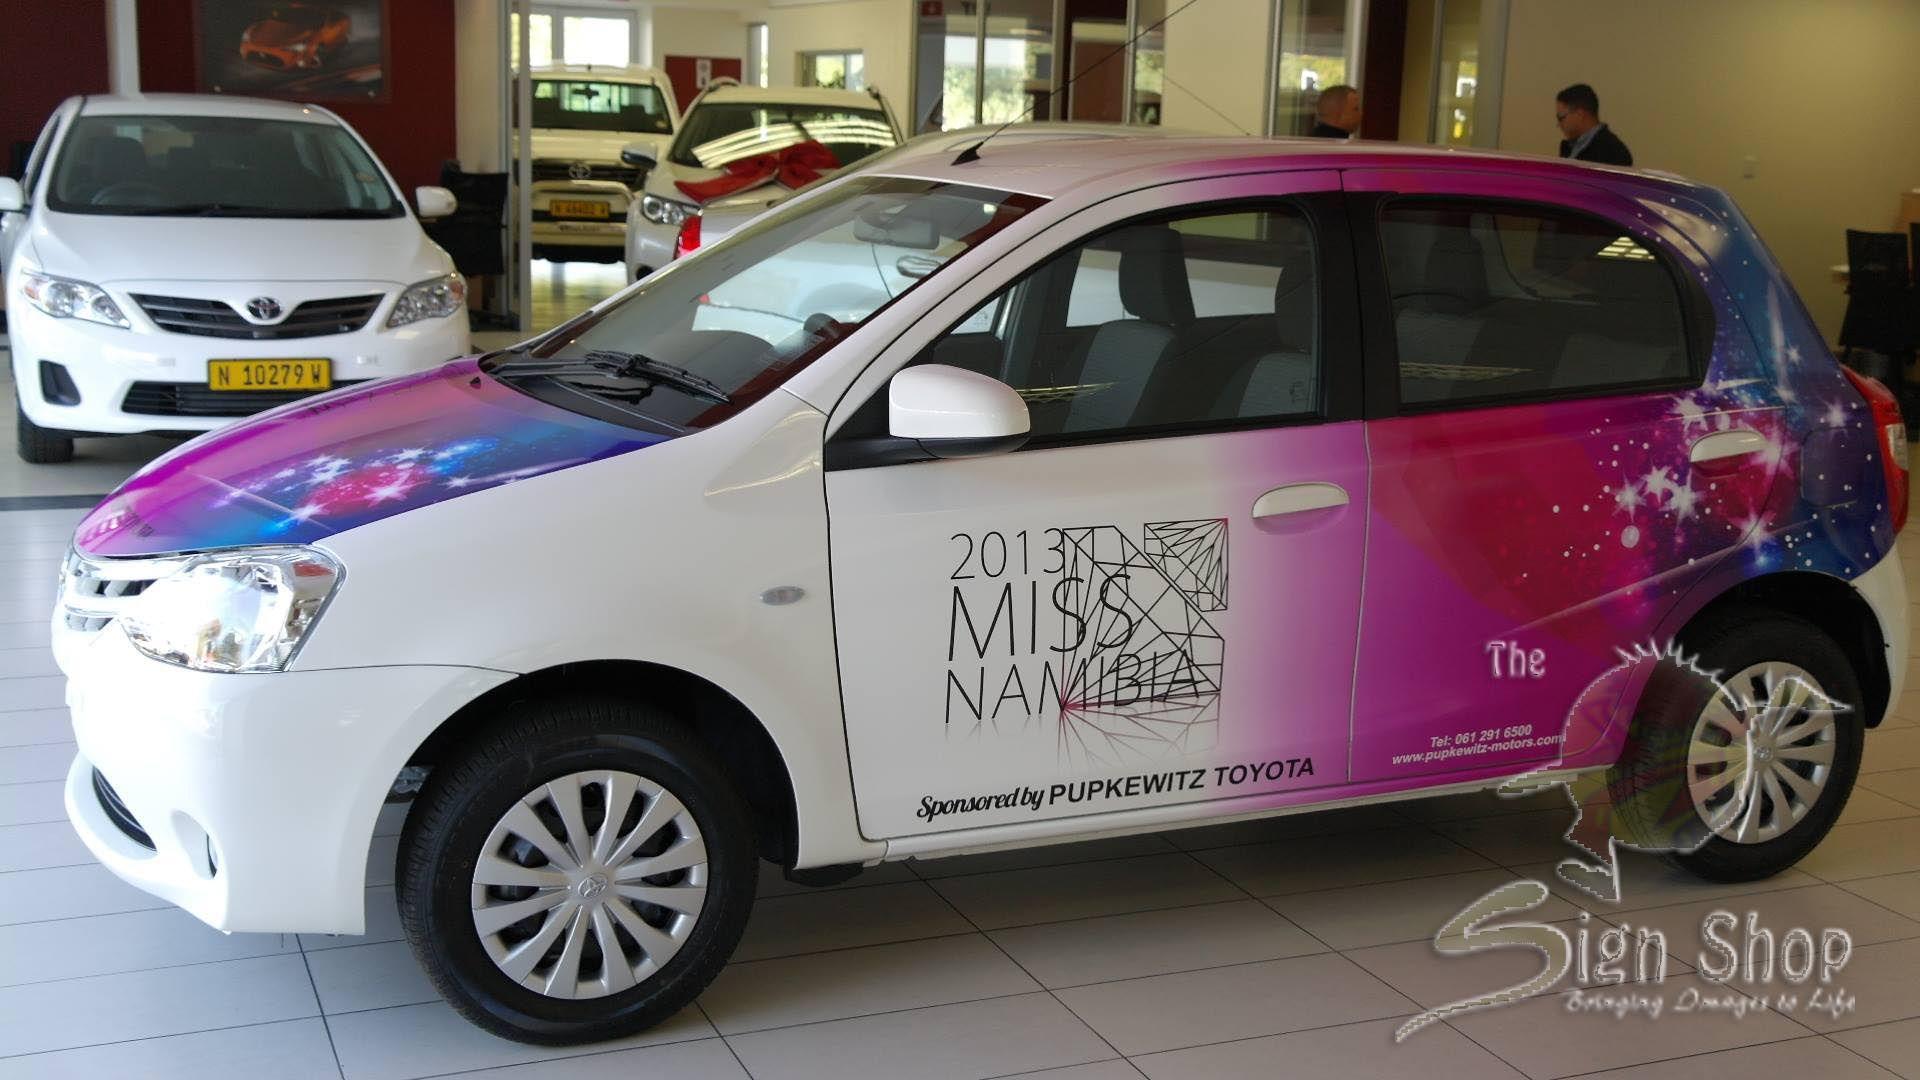 Miss Namibia 2013 vehicle branding